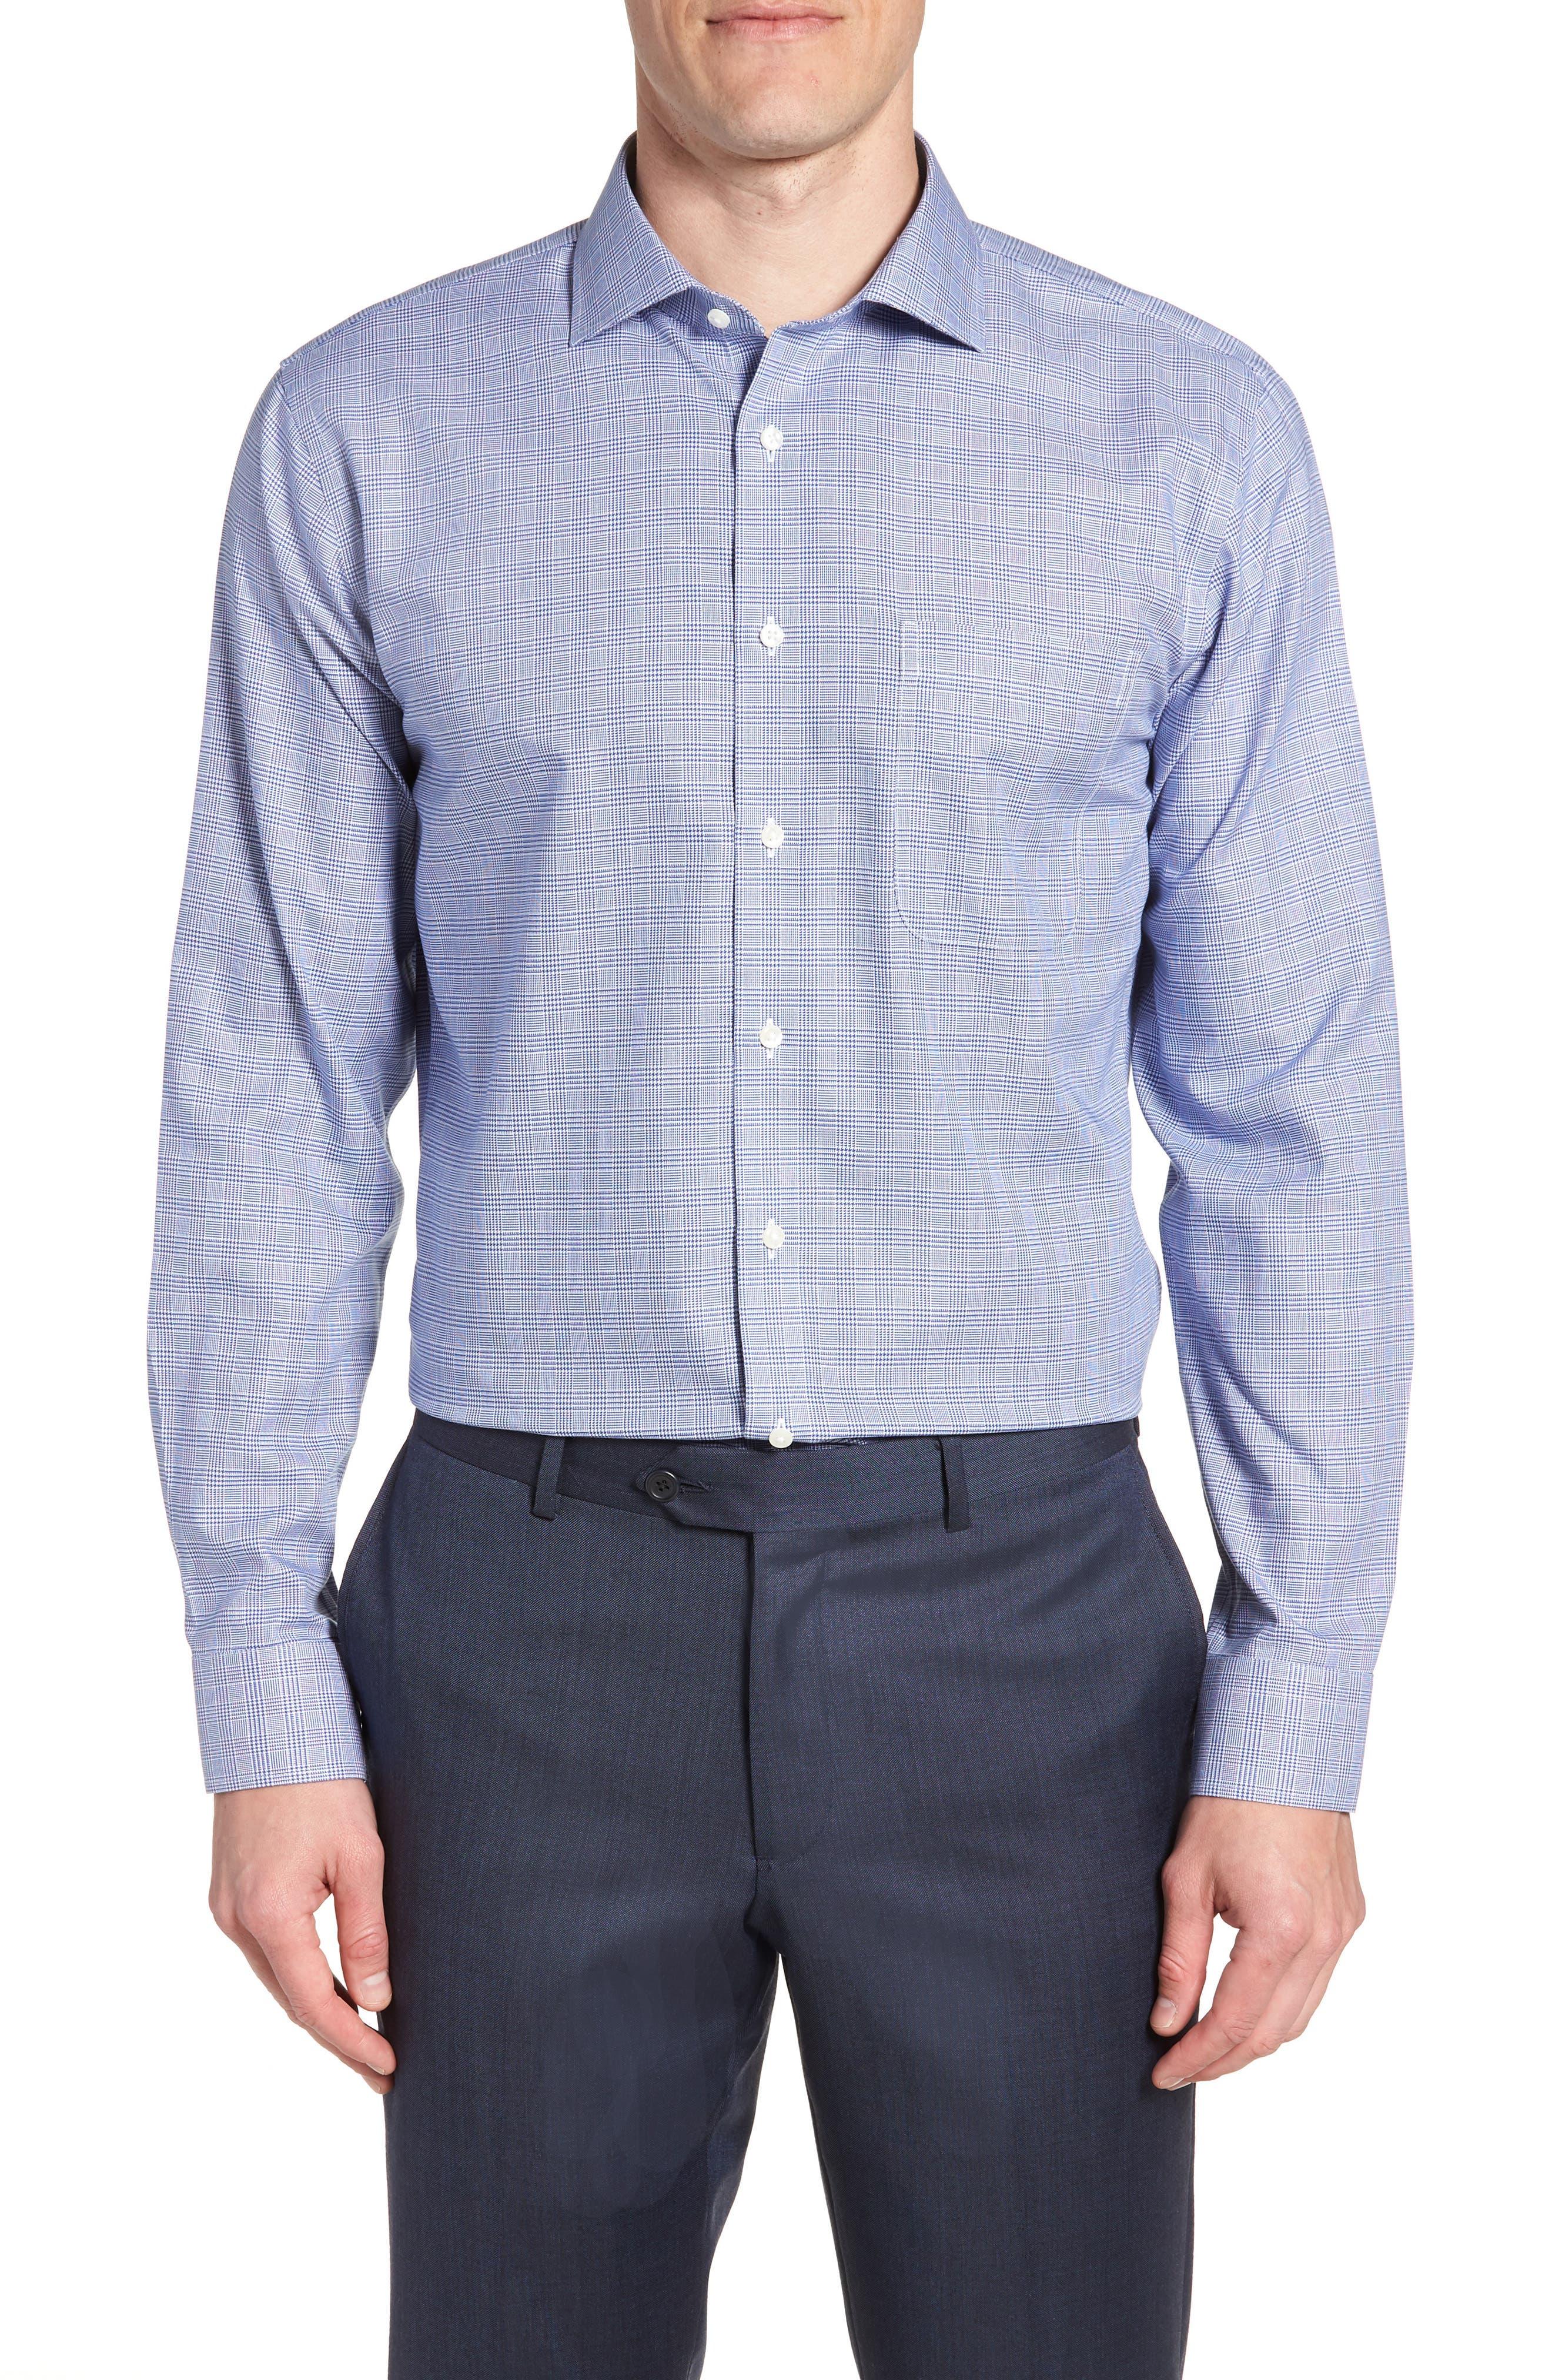 Smartcare<sup>™</sup> Trim Fit Herringbone Dress Shirt,                             Main thumbnail 1, color,                             Blue Marine